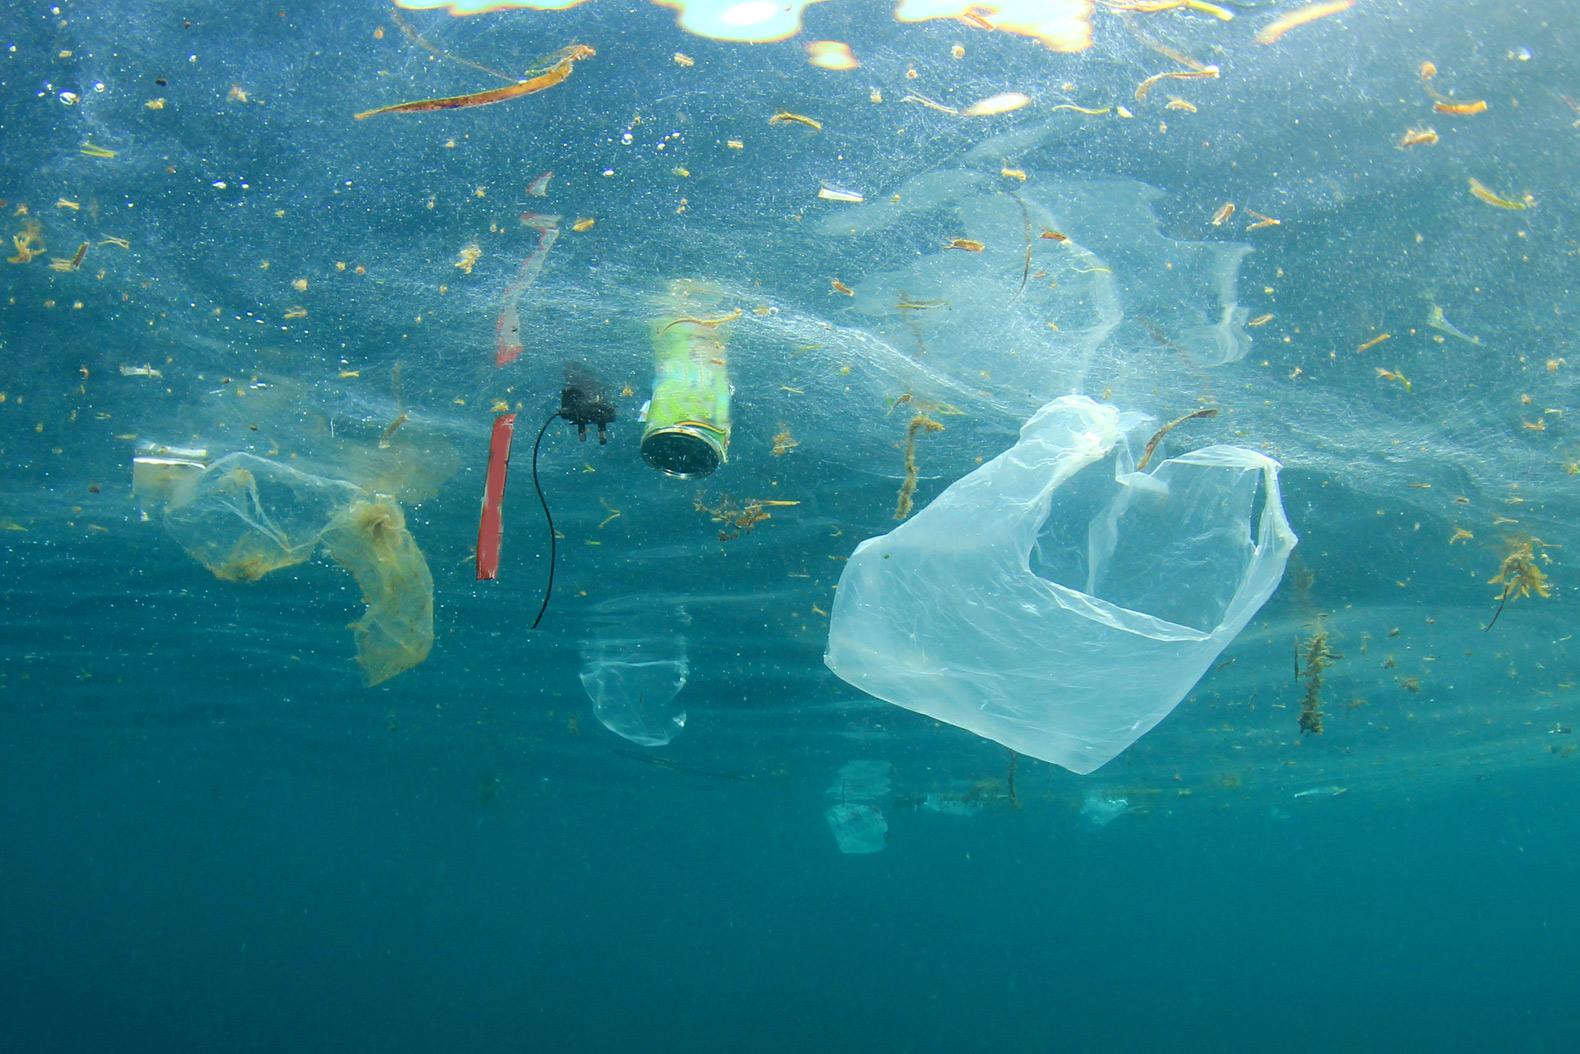 plastic-bag-pollution.jpg